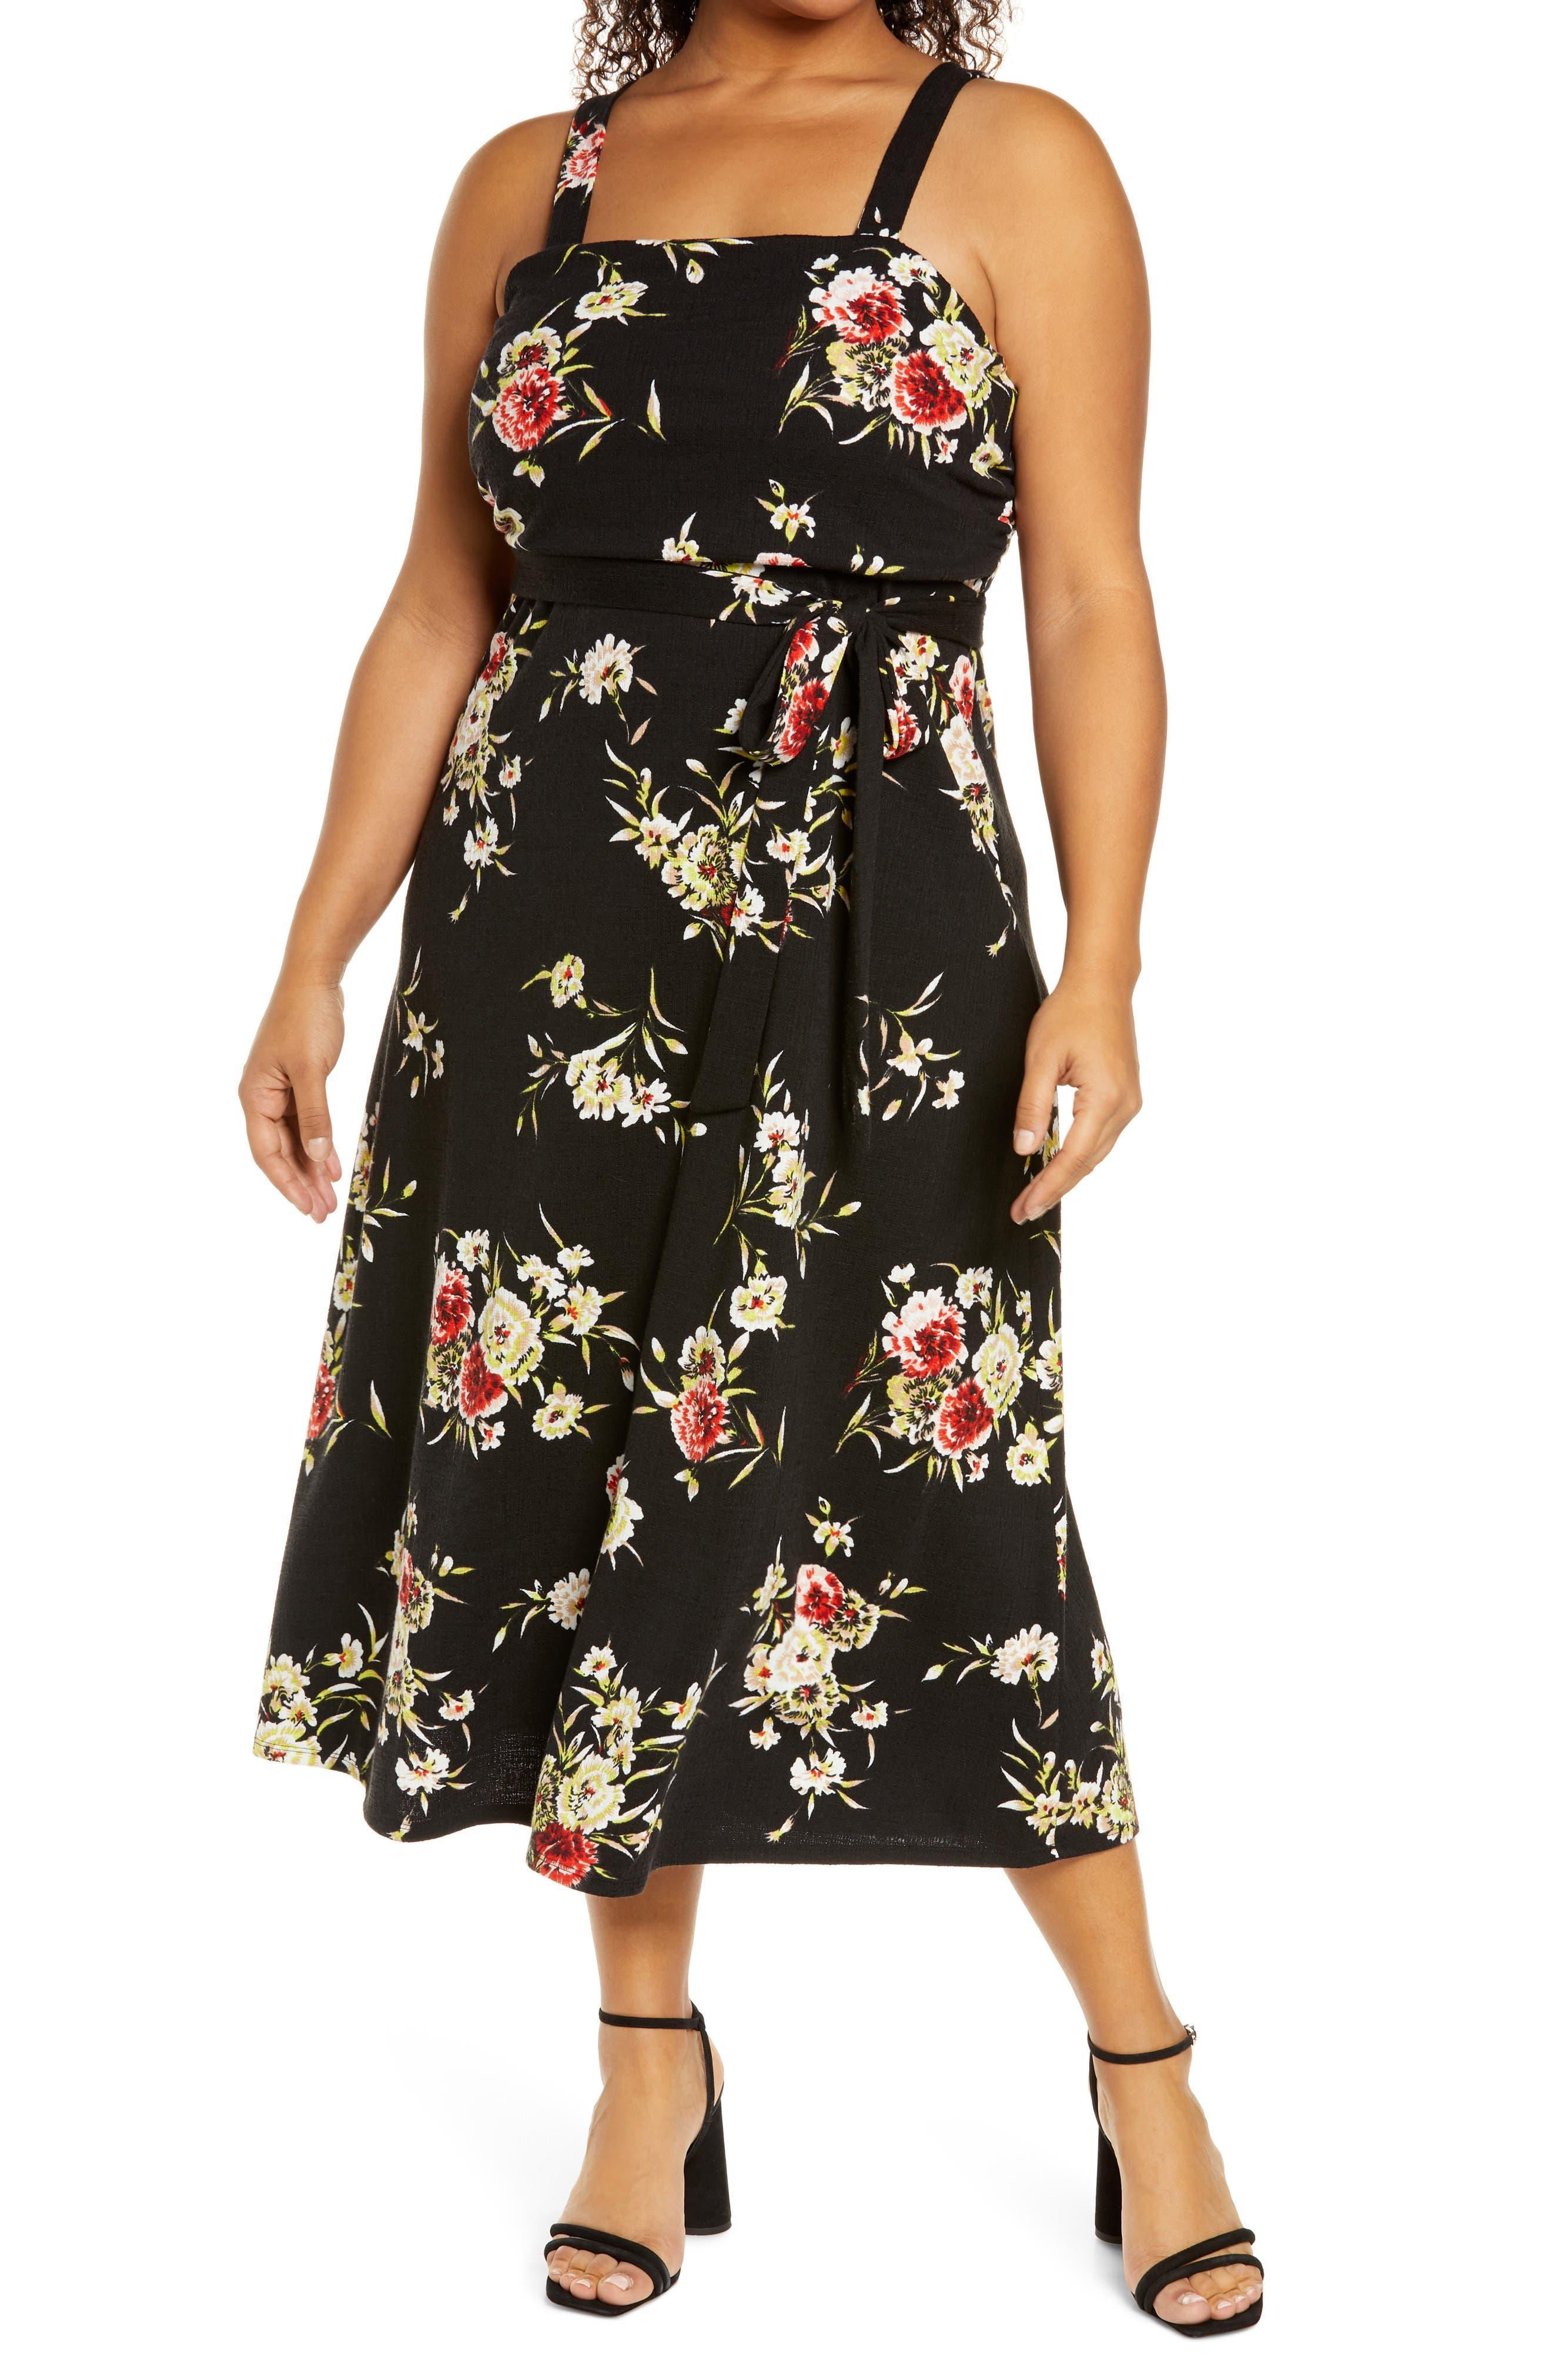 Square Neck Floral Fit & Flare Dress